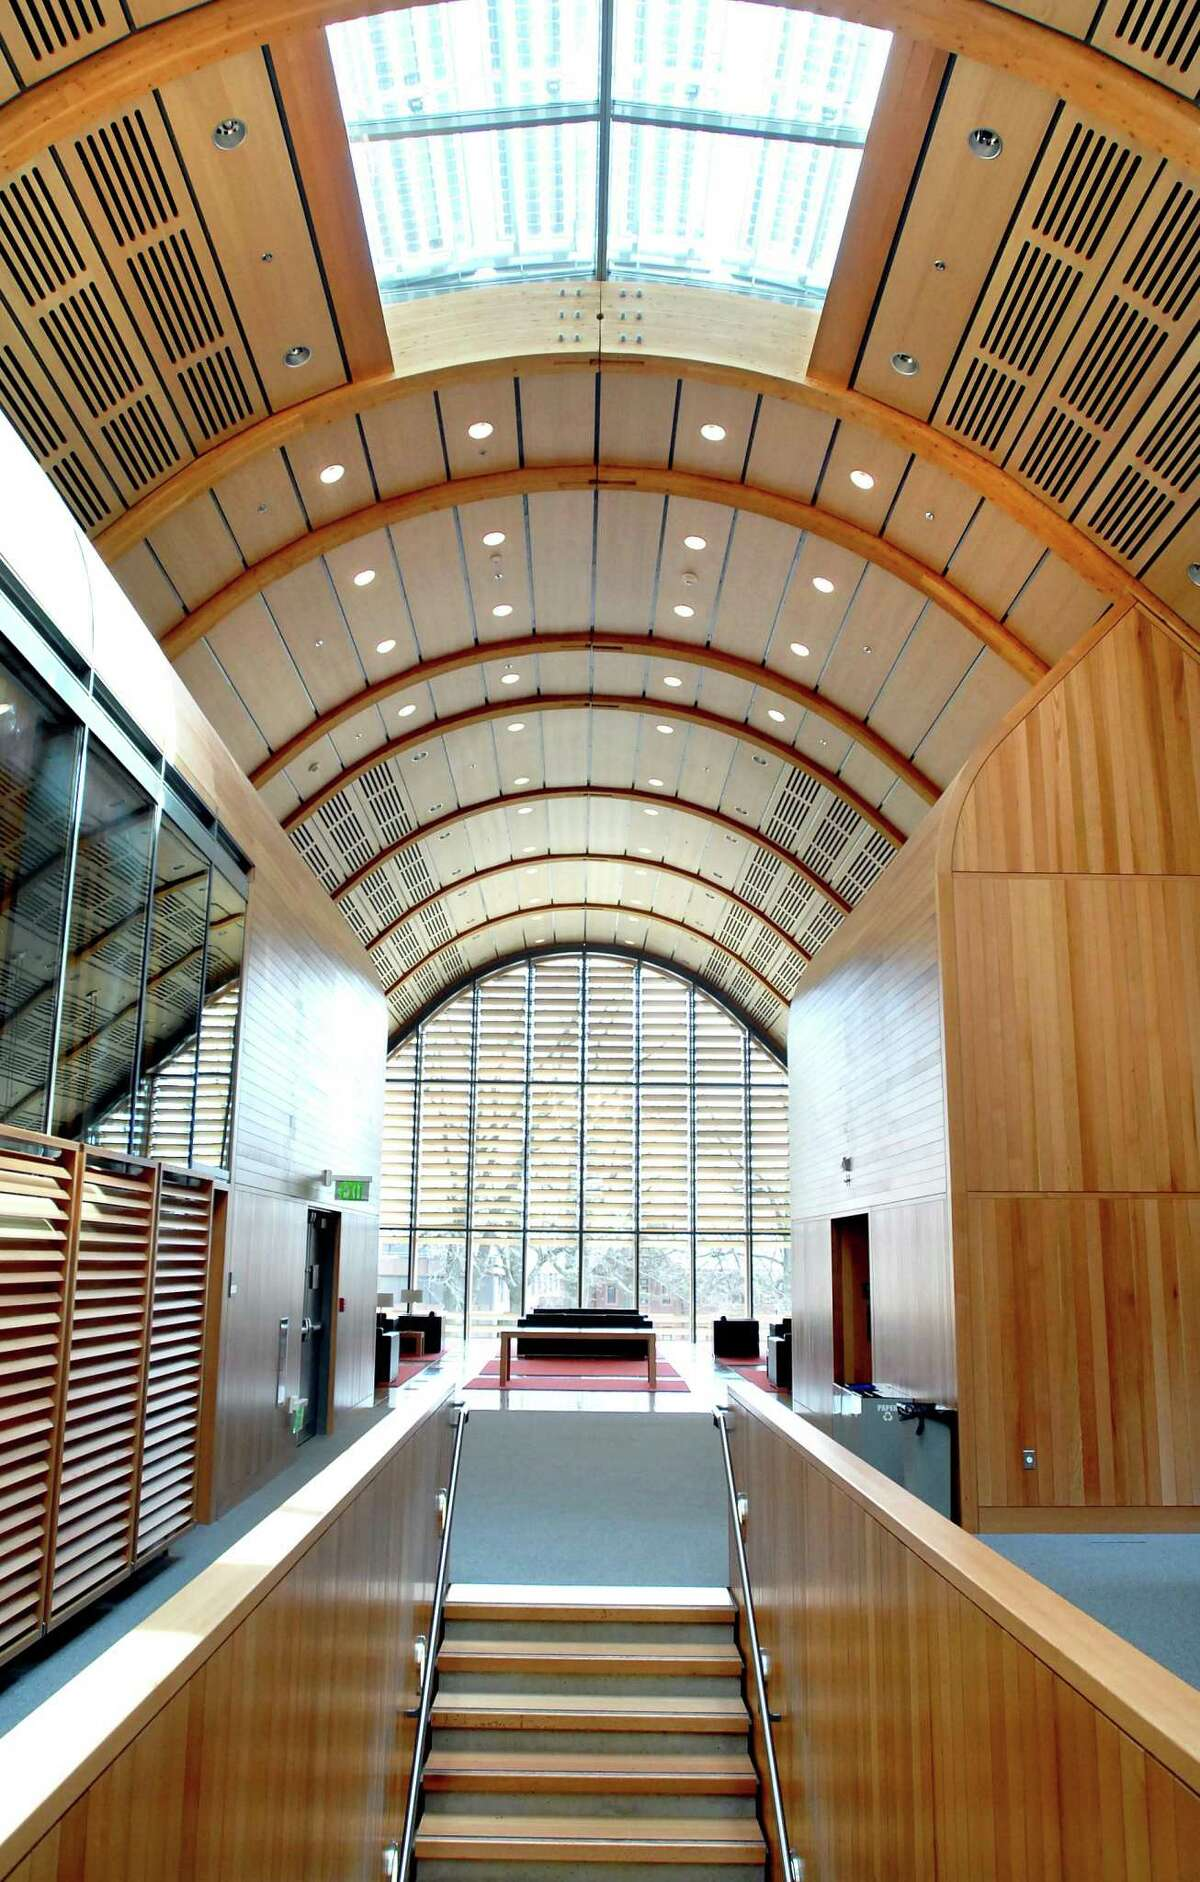 The upper floor of the Yale School of Forestry & Environmental Studies' Kroon Hall.